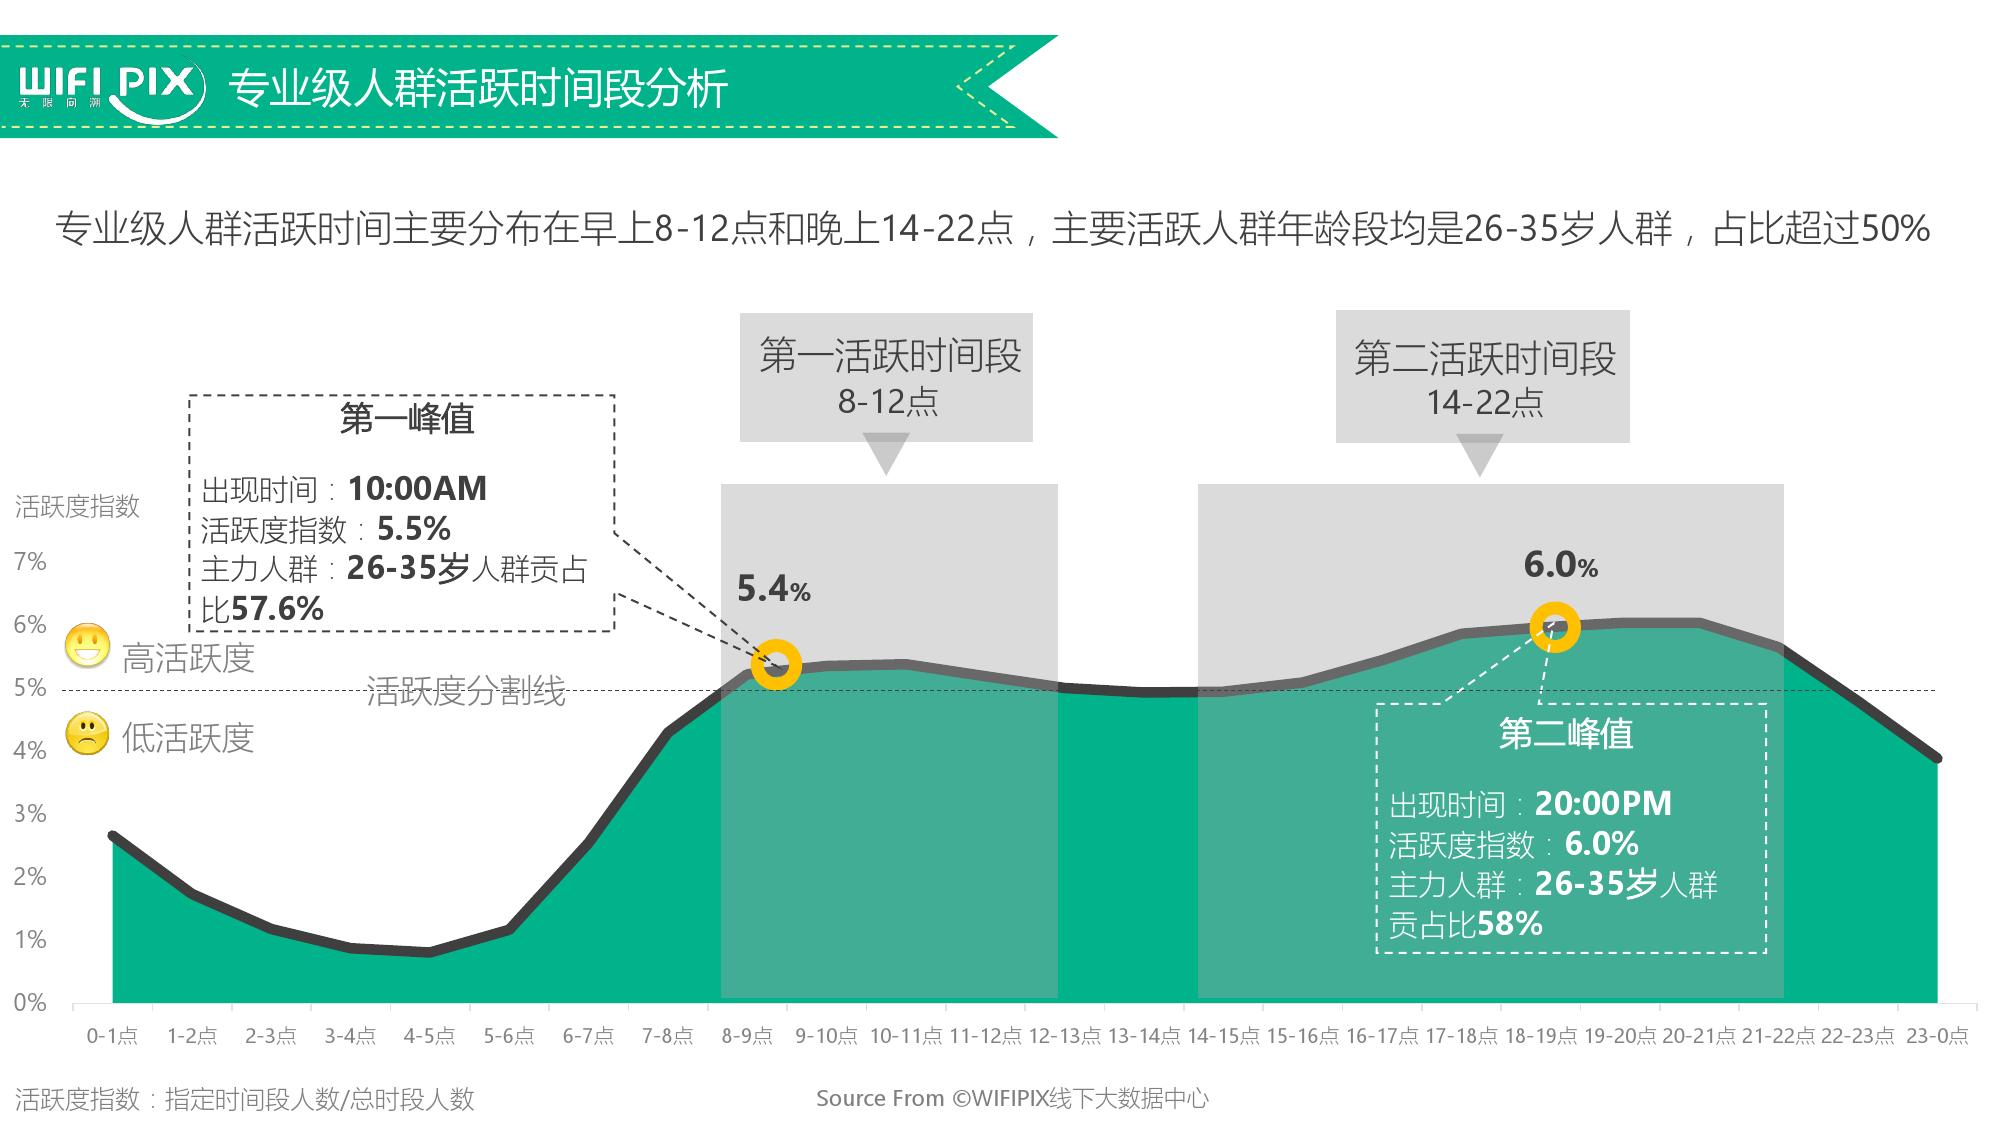 2016%e5%8c%97%e4%ba%ac%e4%bd%93%e8%82%b2%e8%bf%90%e5%8a%a8%e4%ba%ba%e7%be%a4%e6%95%b0%e6%8d%ae%e6%b4%9e%e5%af%9f%e5%88%86%e6%9e%90%e6%8a%a5%e5%91%8a_000016